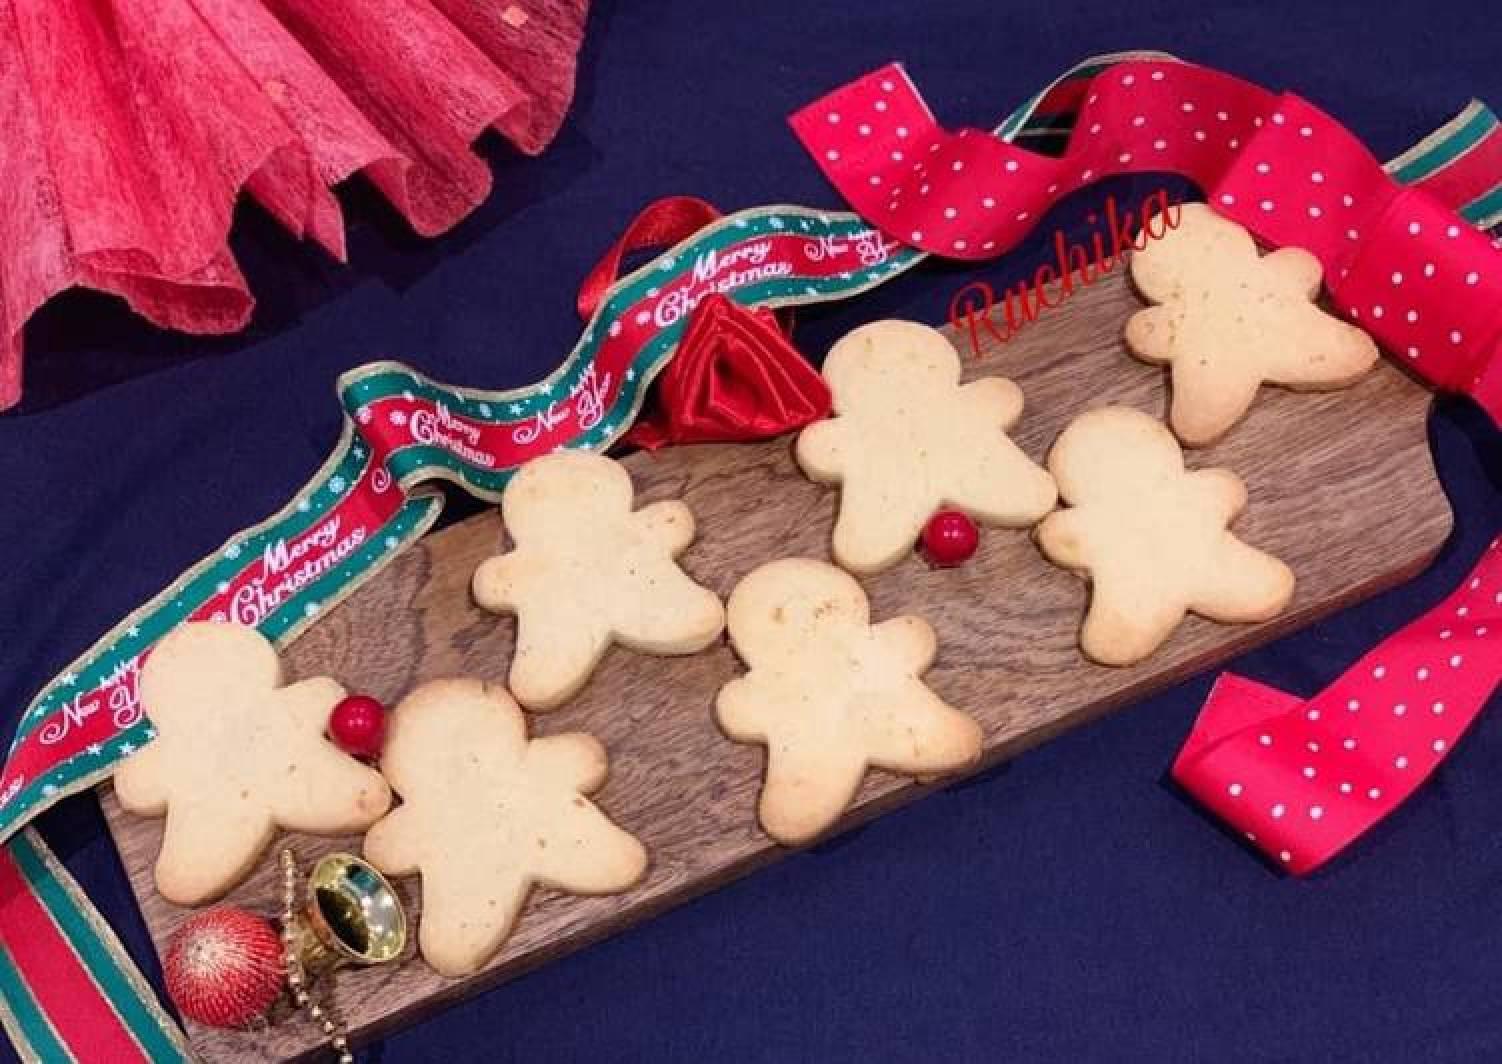 Gingerbread Man shortbread cookies